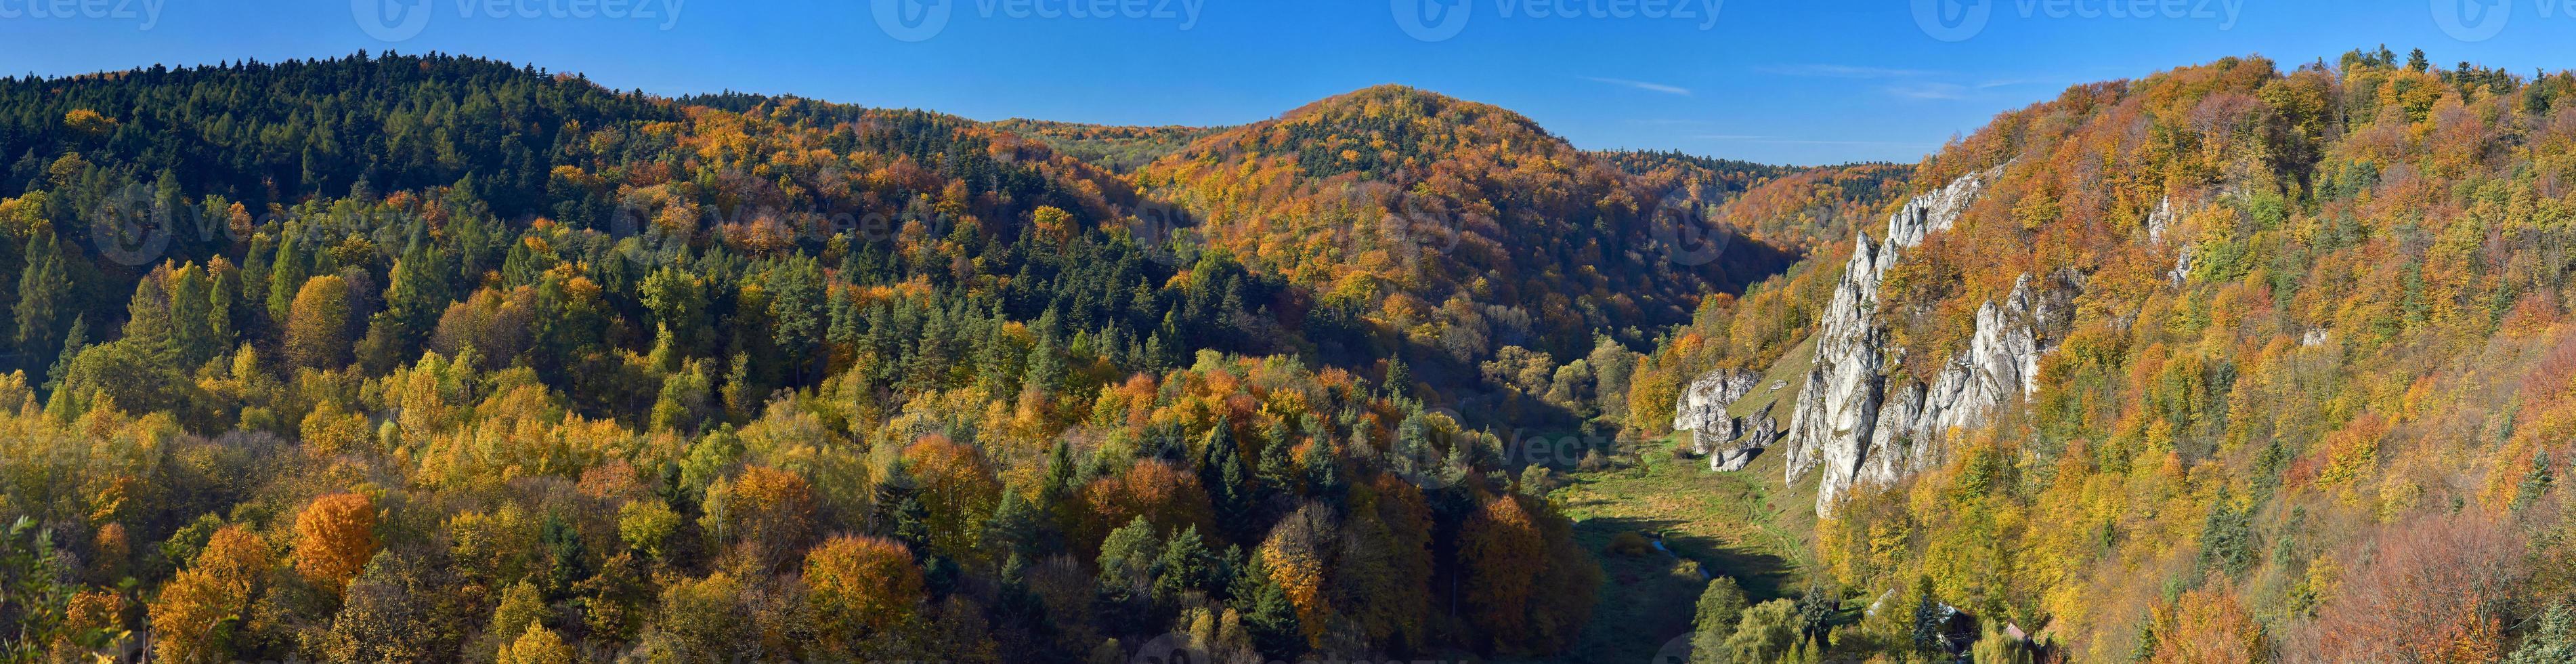 Autumn in Ojcow National Park. photo